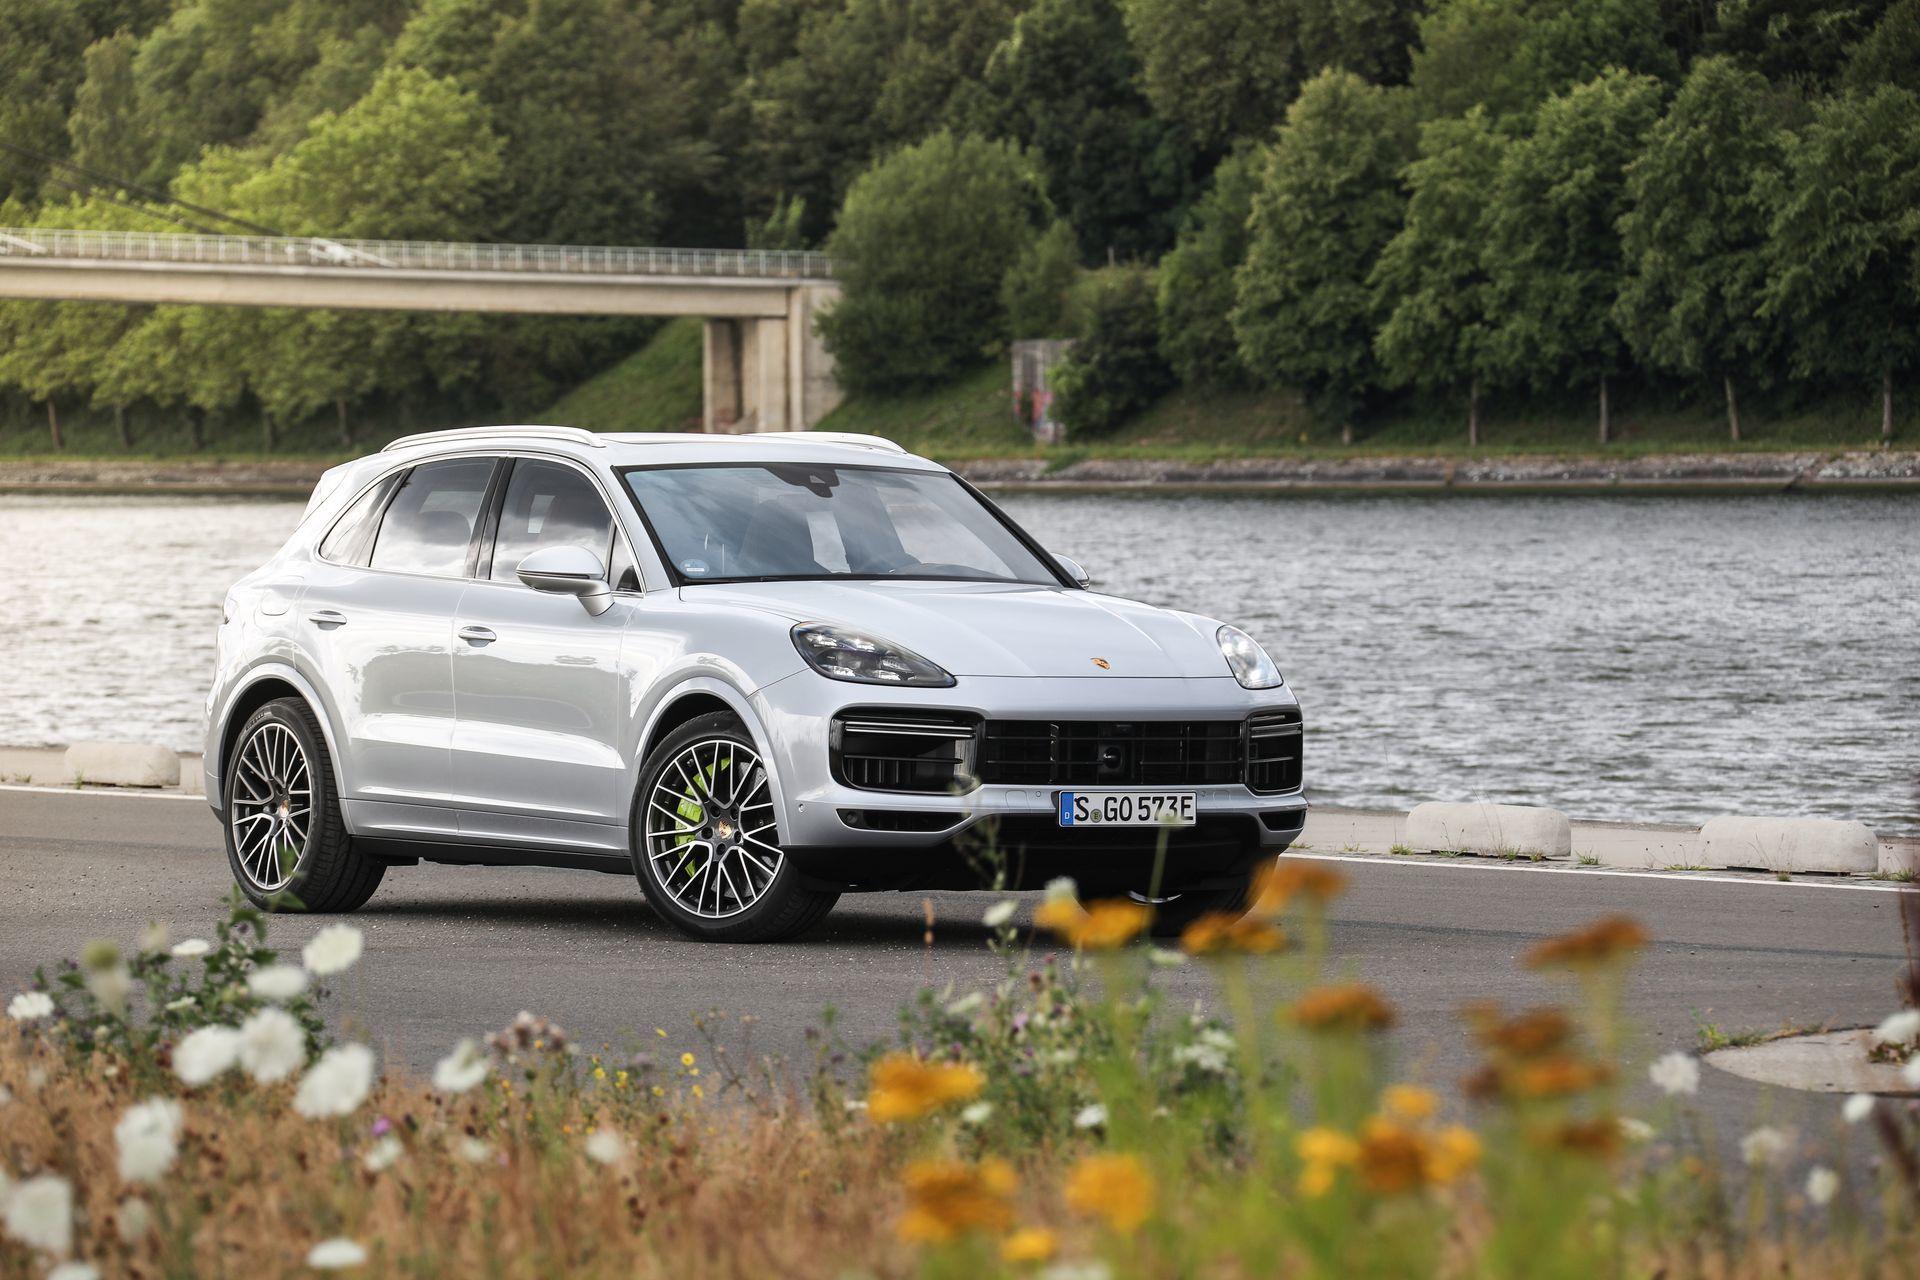 Prueba Porsche Cayenne Turbo S E Hybrid 20